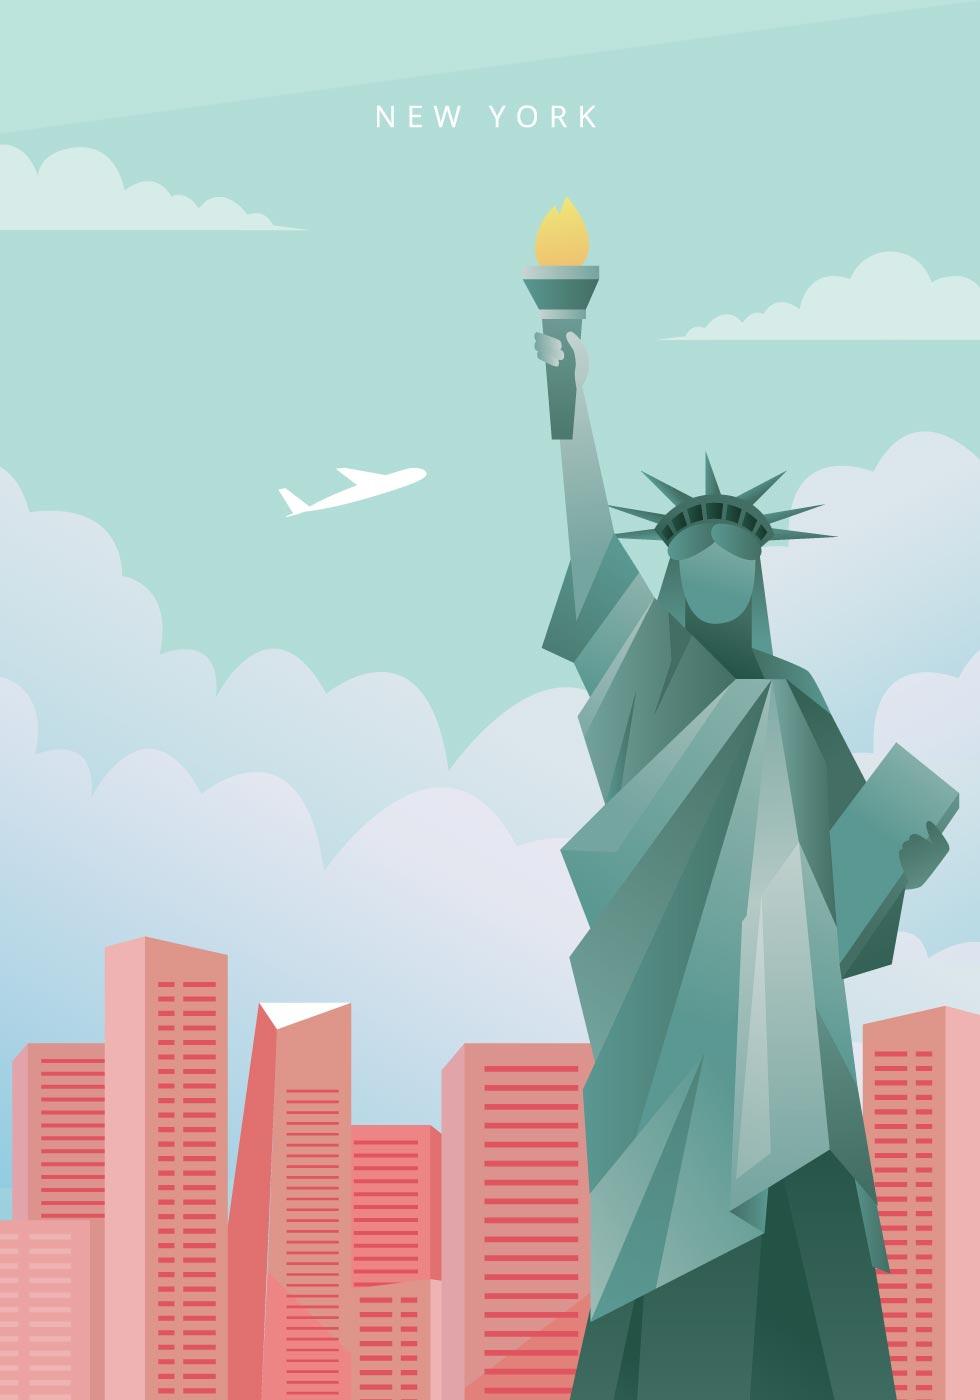 new york city illustration  download free vectors